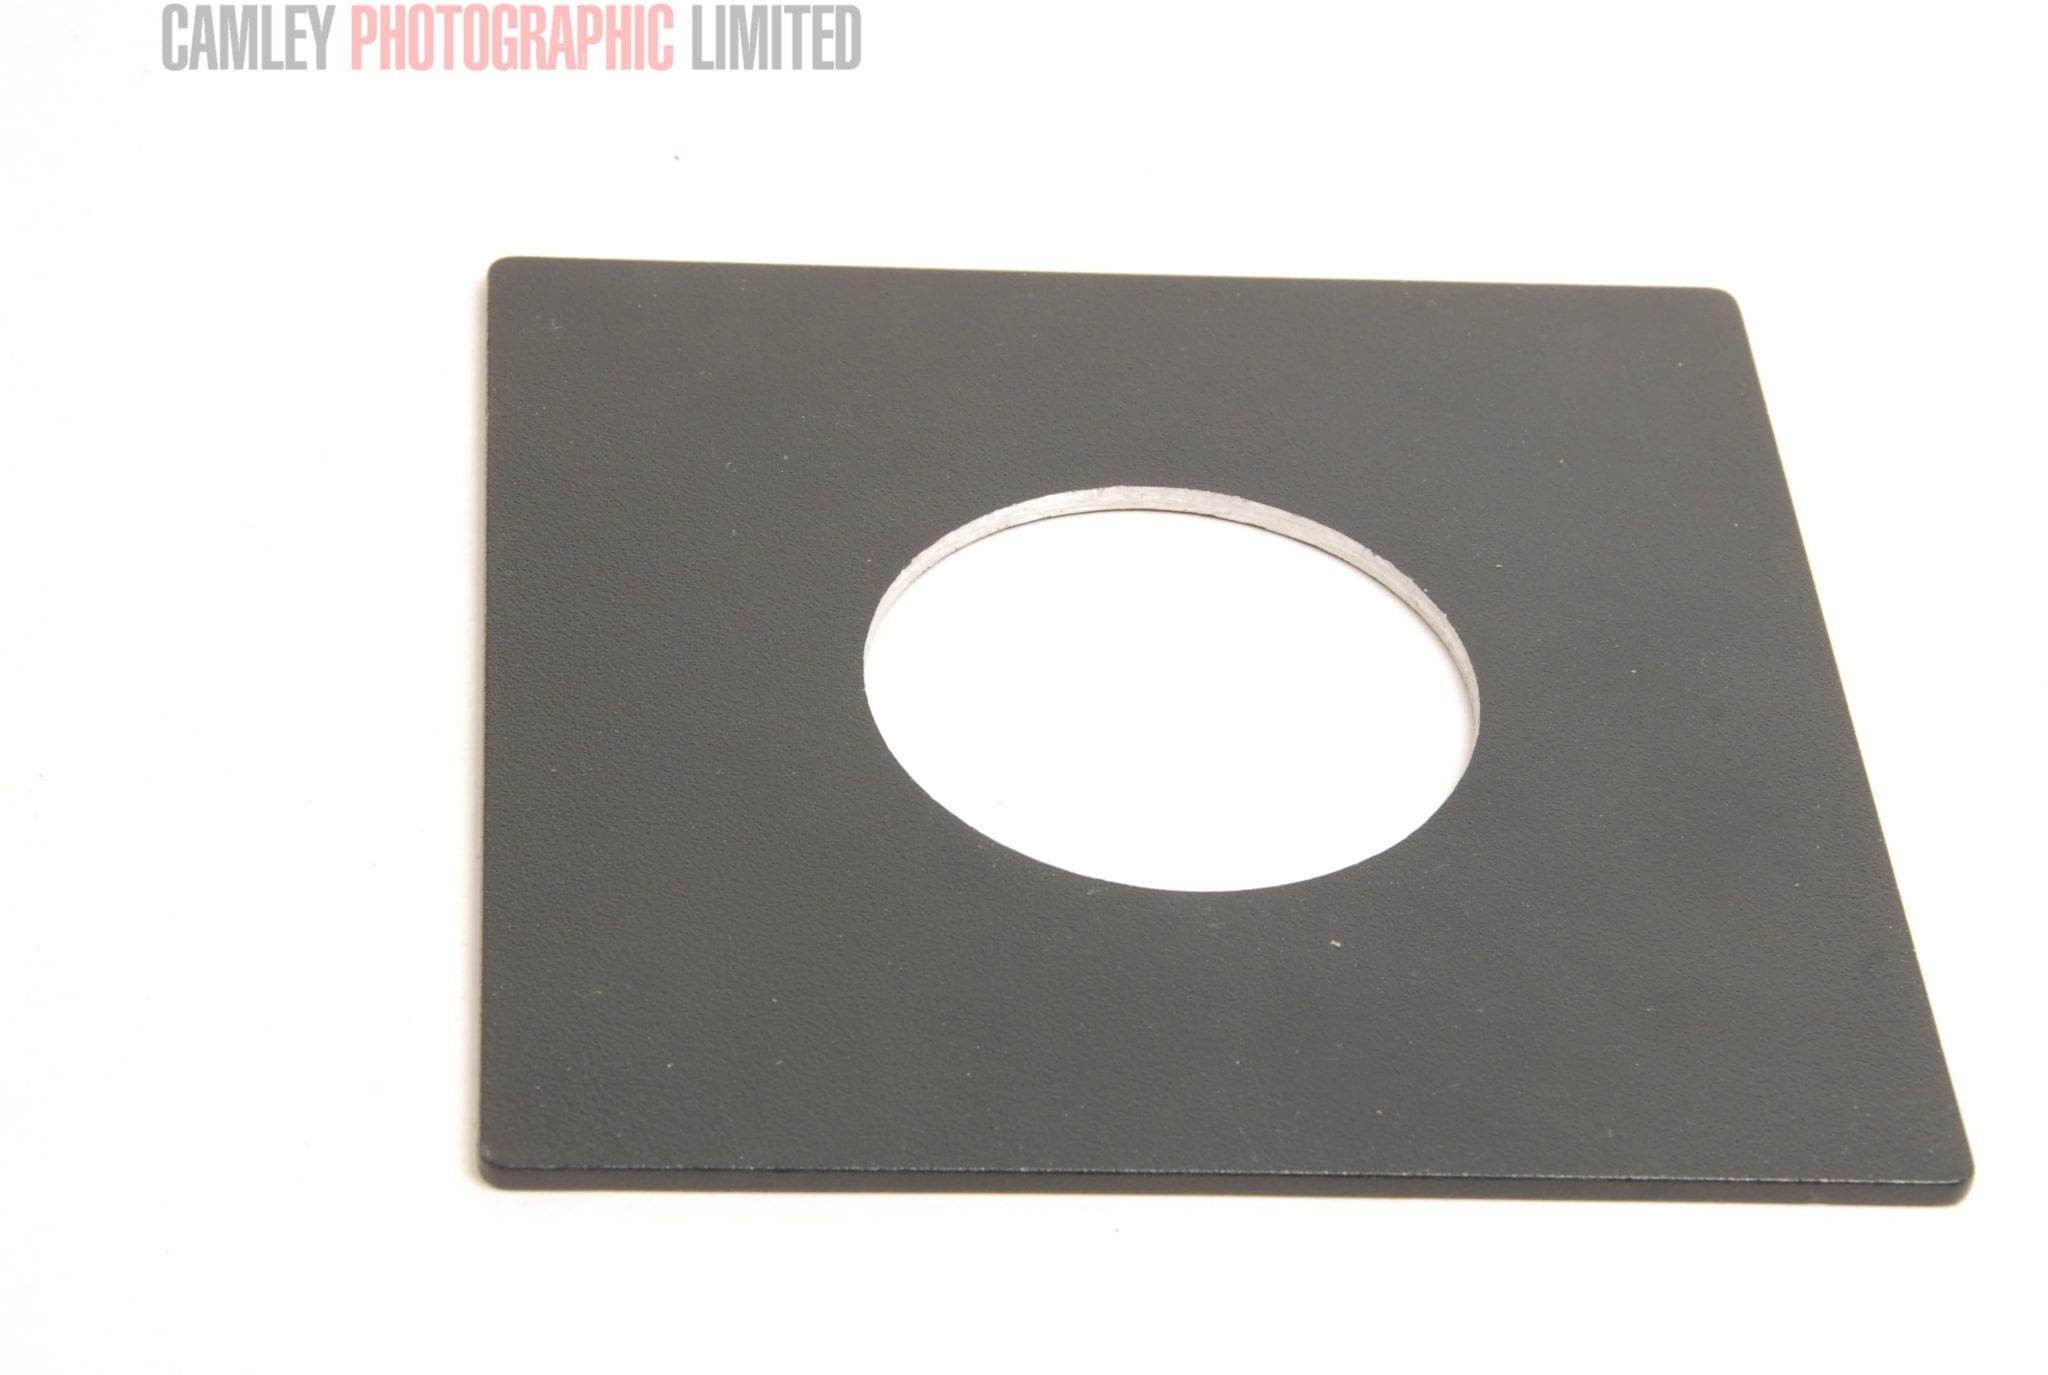 Copal #1 41.6mm Condition 4E Sinar Lens Board 6934